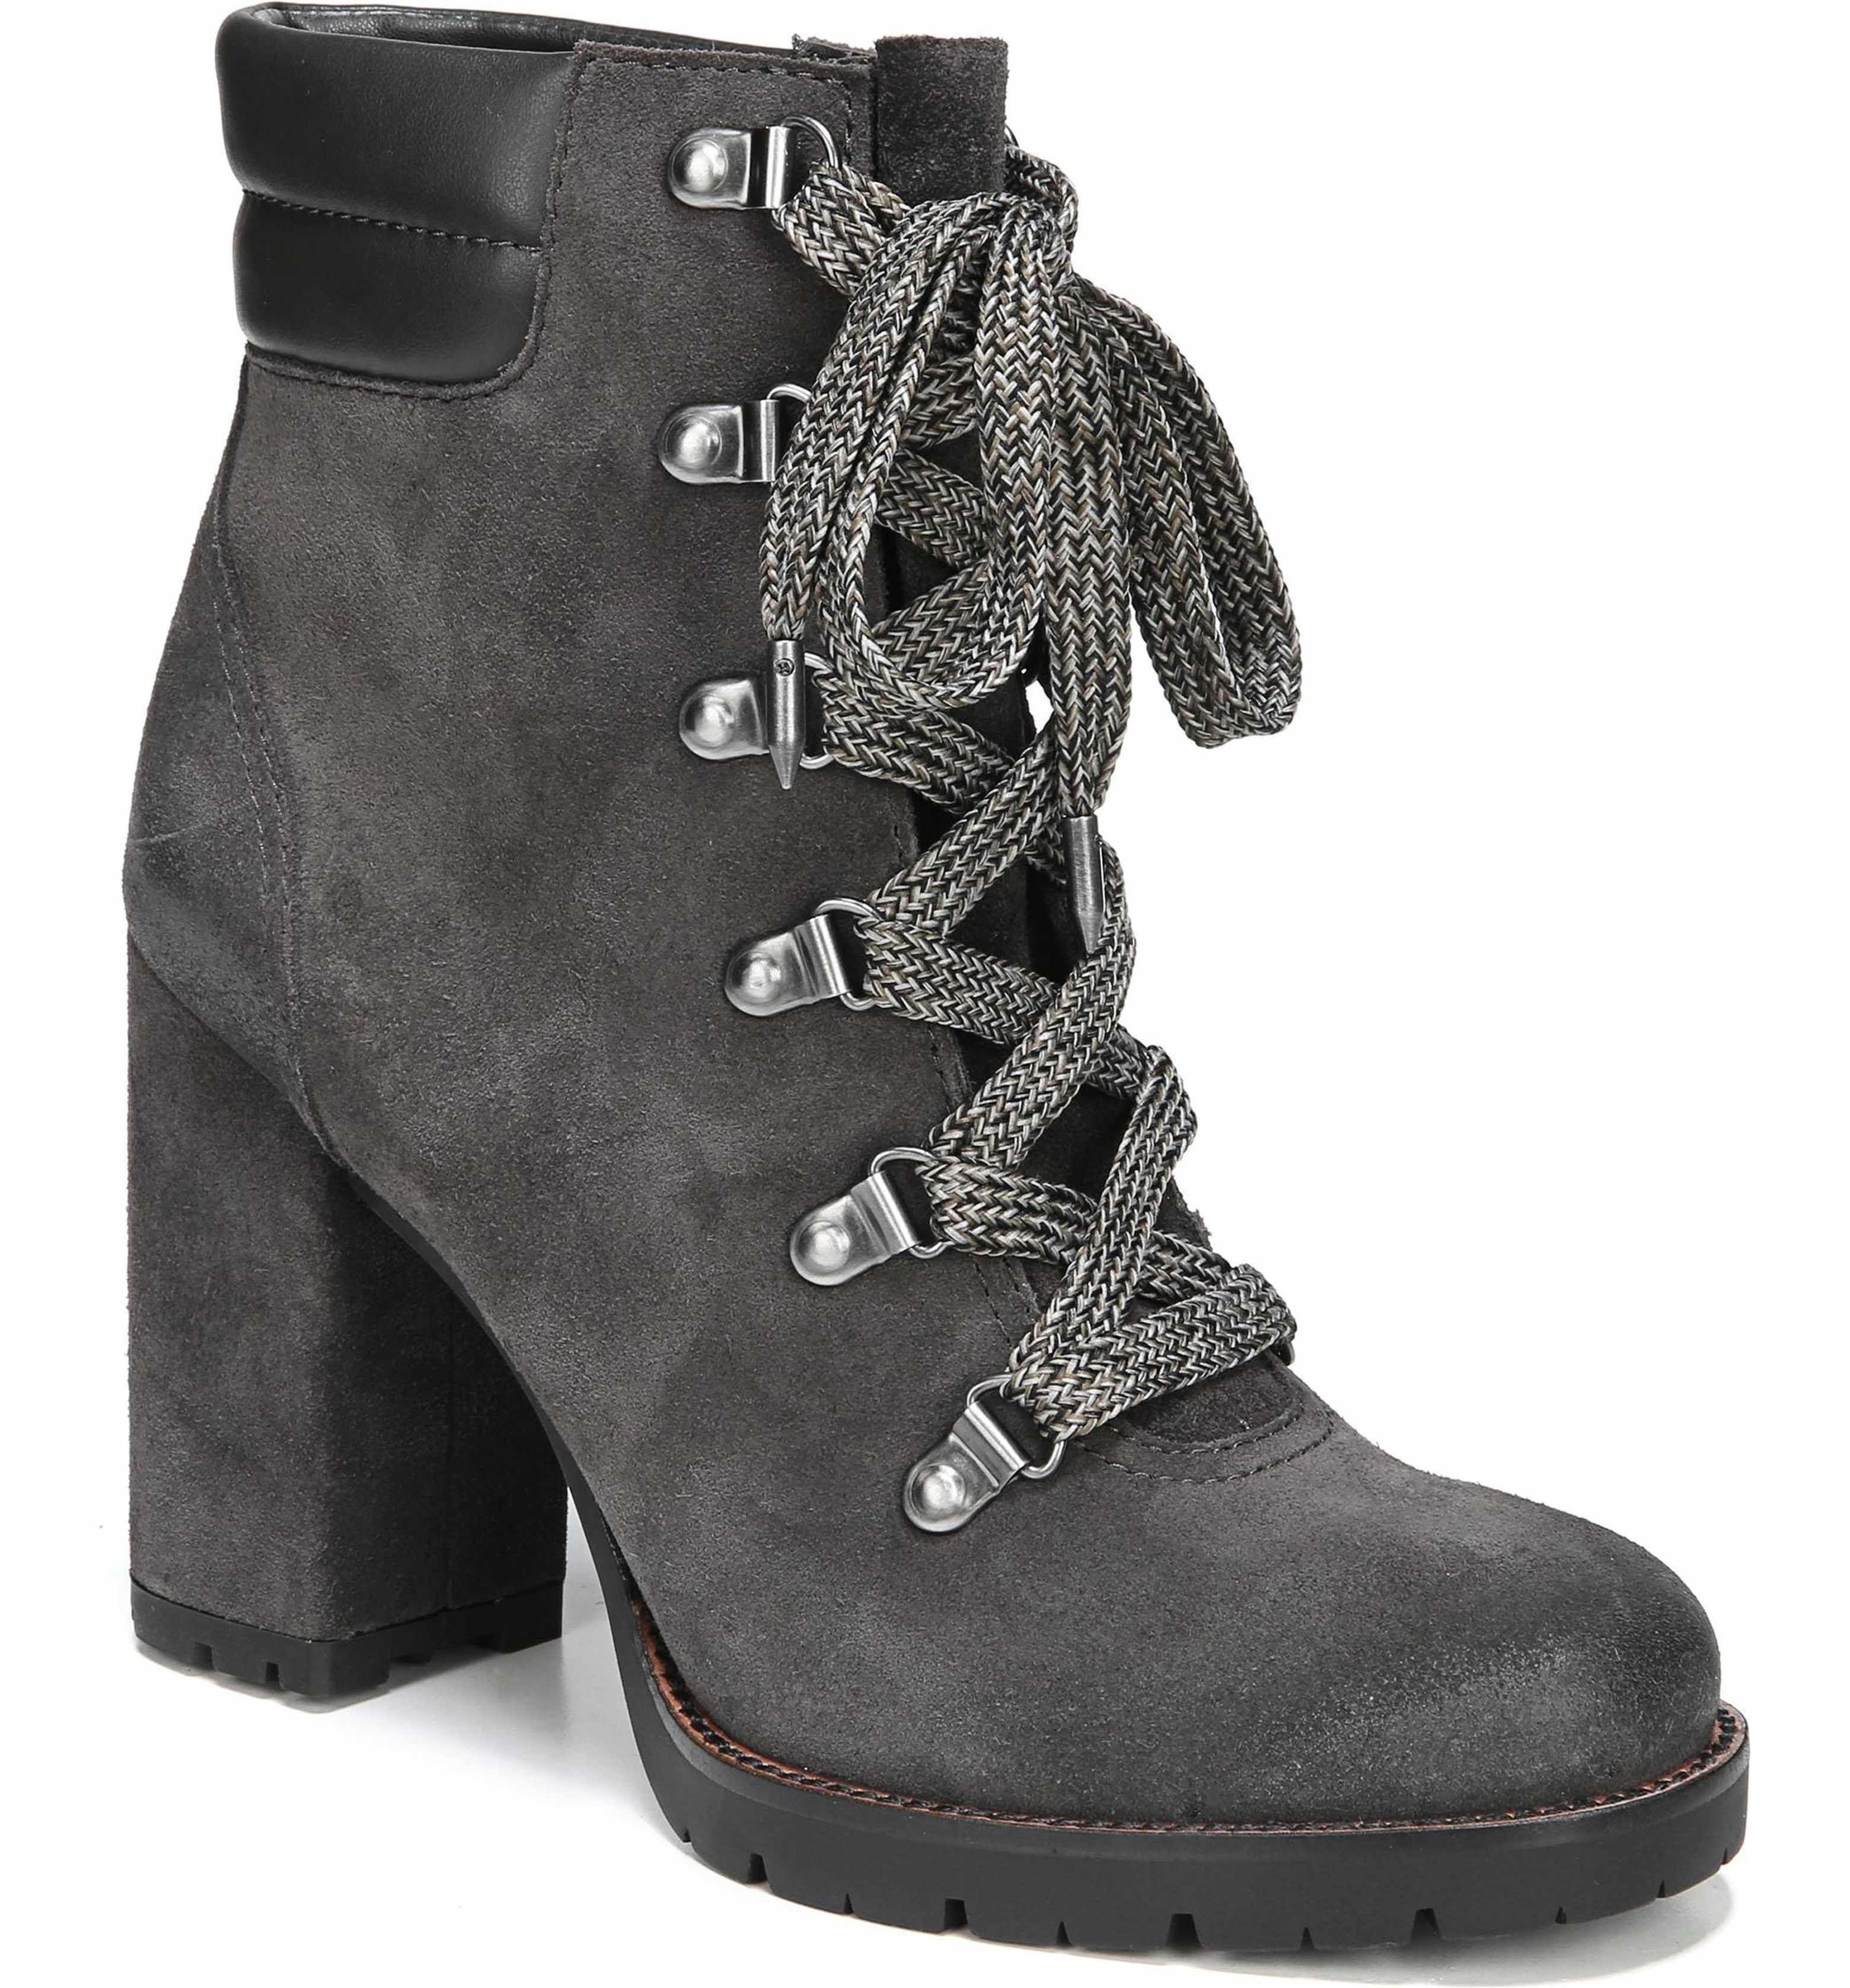 23eb7480f1ca64 Main Image - Sam Edelman Carolena Lace-Up Boot (Women)